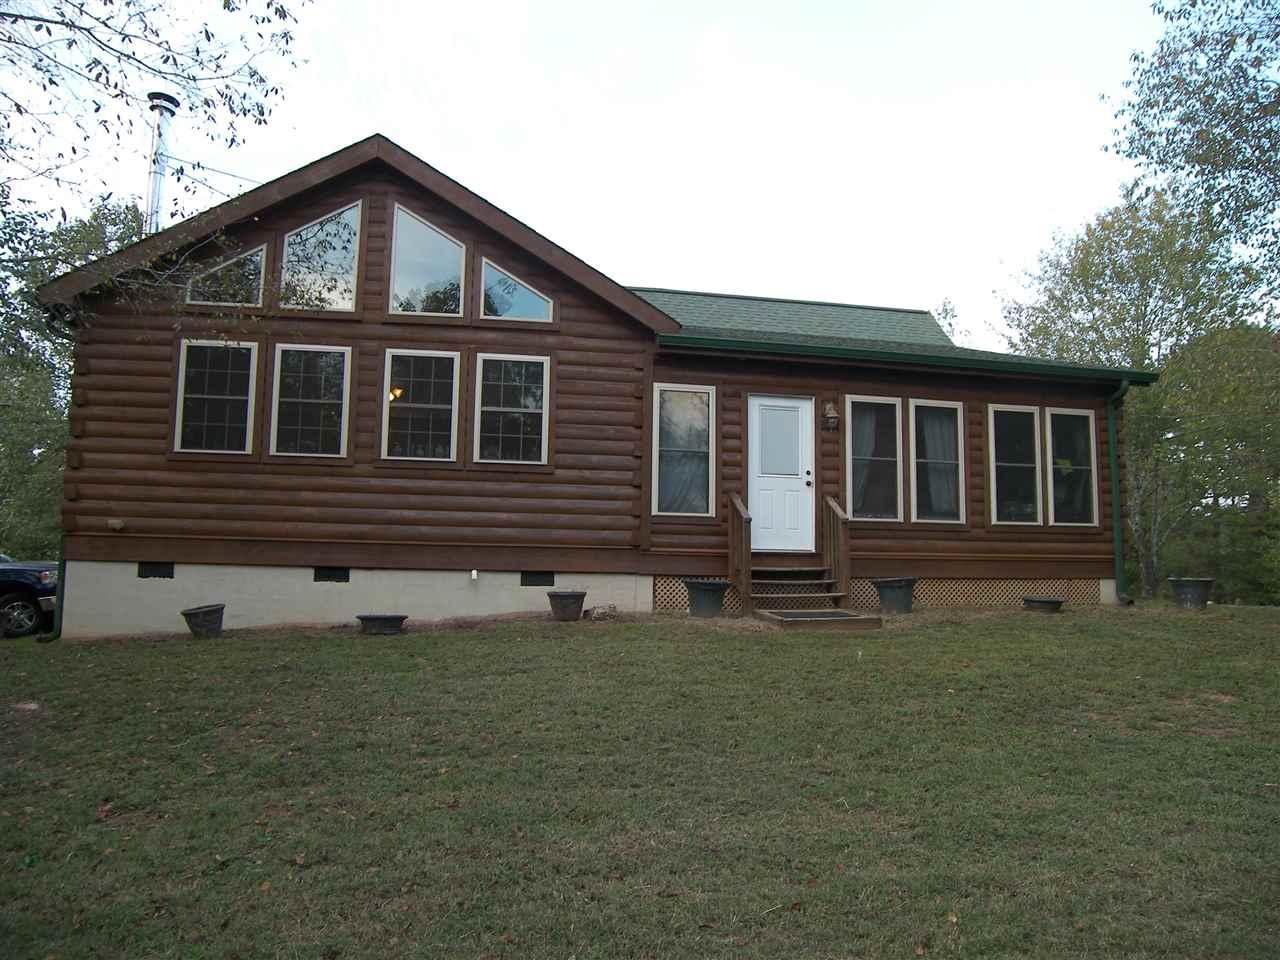 599 Wells Mill Rd, Bostic, NC 28018